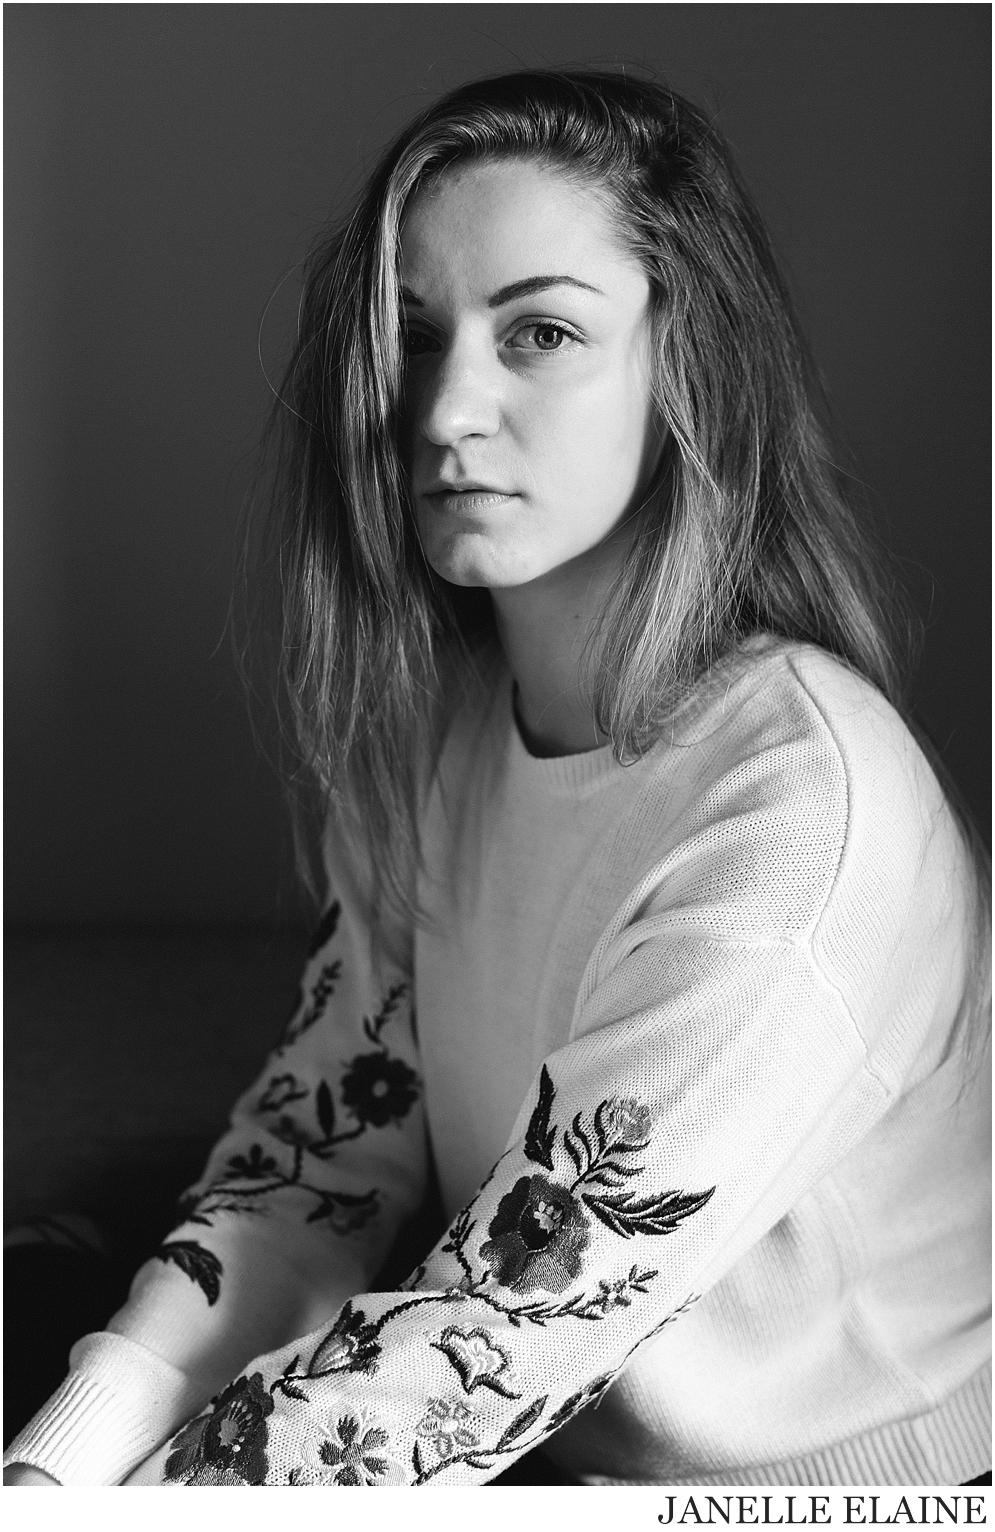 kirsi-seattle-wa-portrait photography-janelle elaine photography-56.jpg